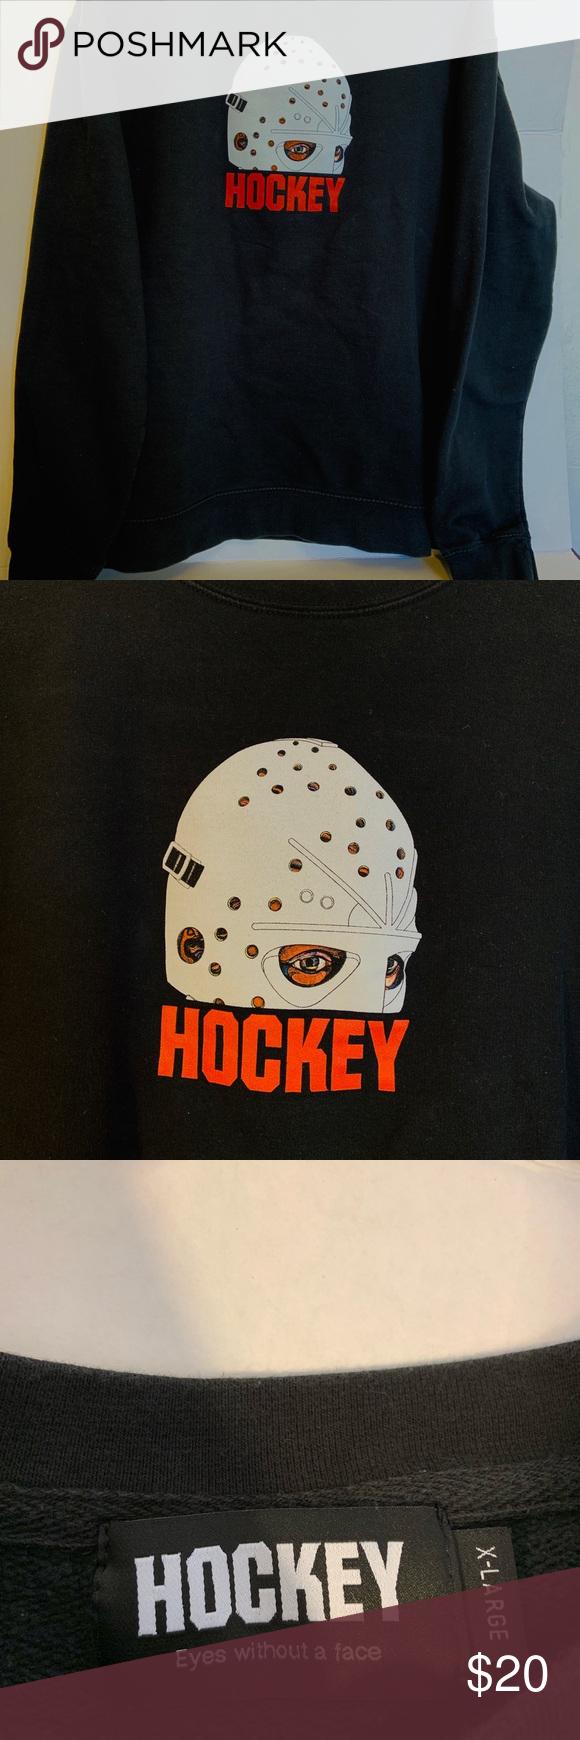 Black Hockey Skateboard Sweater X Large Crew Neck Hockey Skateboard Sweater Black With Hockey Mask And Logo Hockey S Crew Neck Sweater Sweaters Black Sweaters